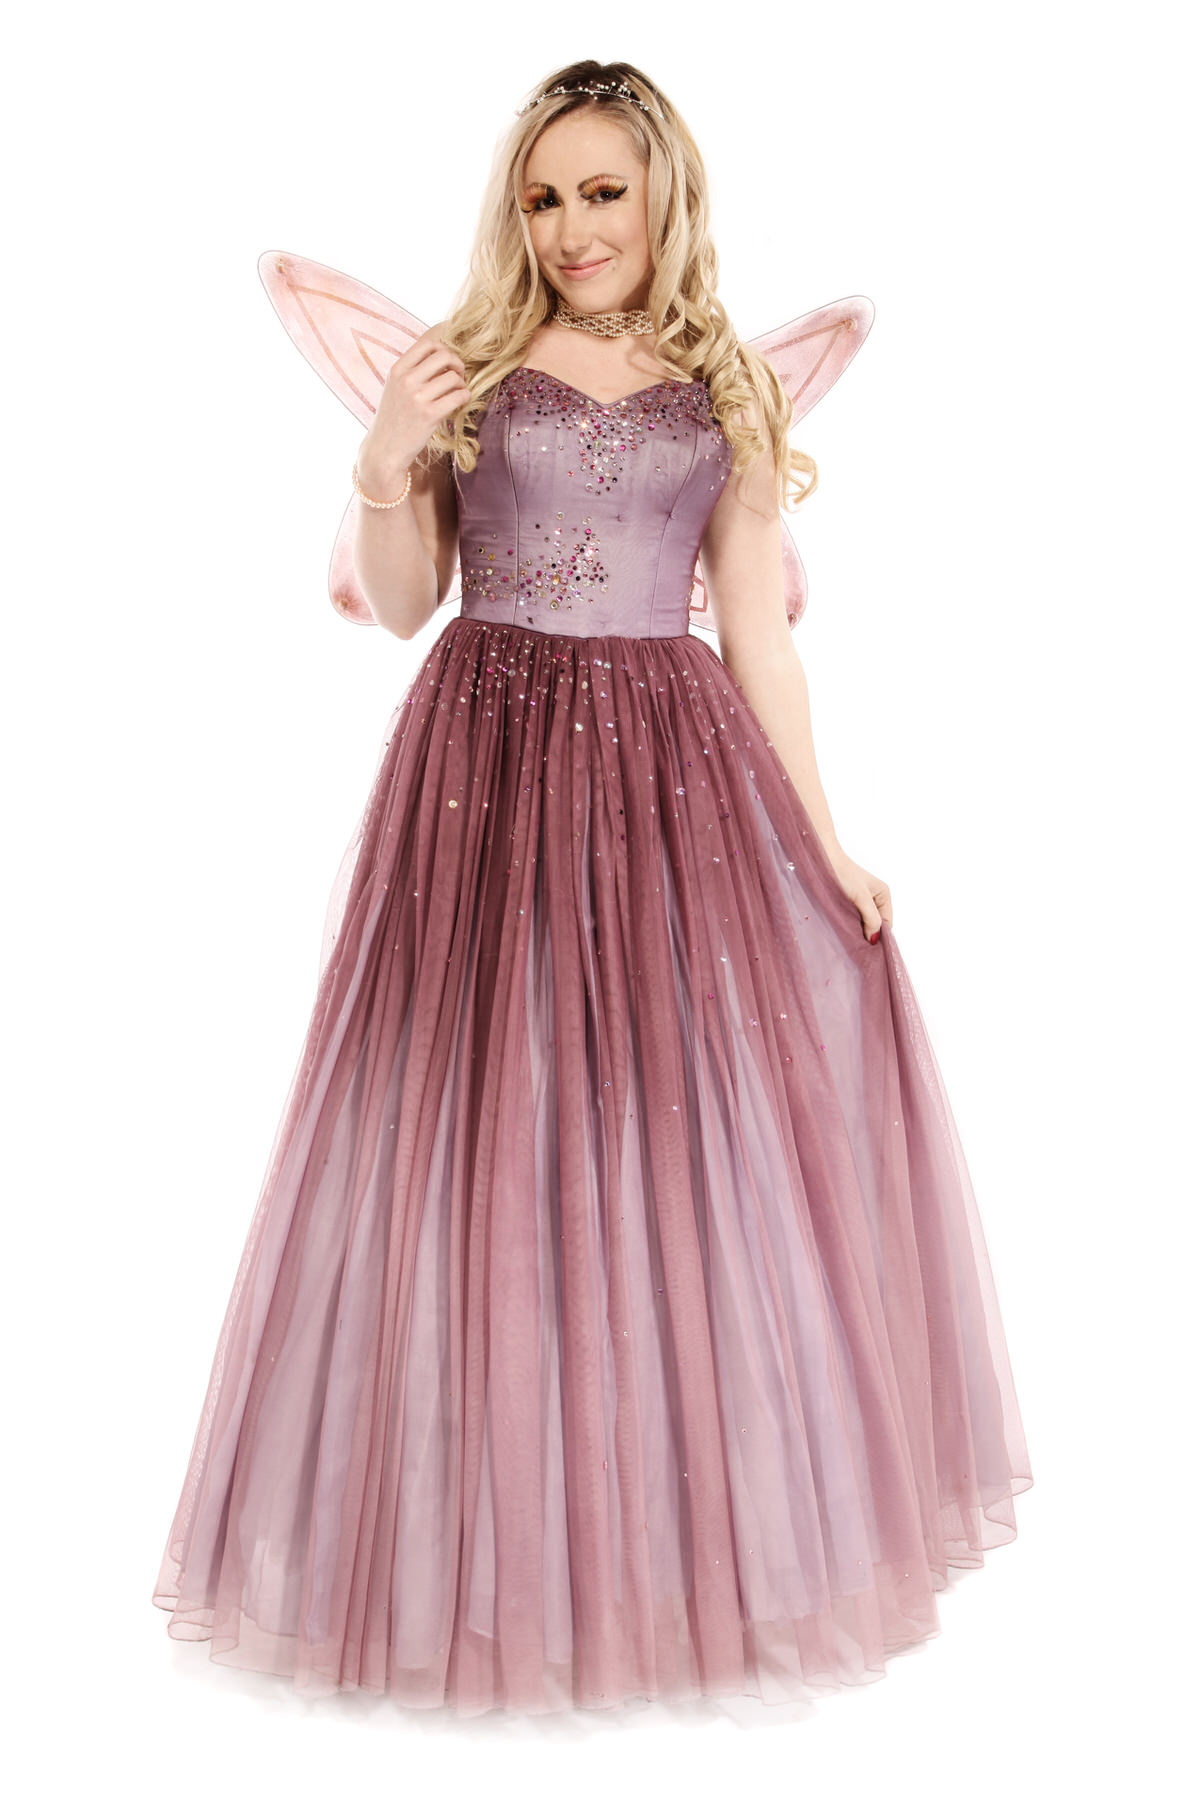 FAIRY PRINCESS COSTUME W WINGS & PEARL TIARA